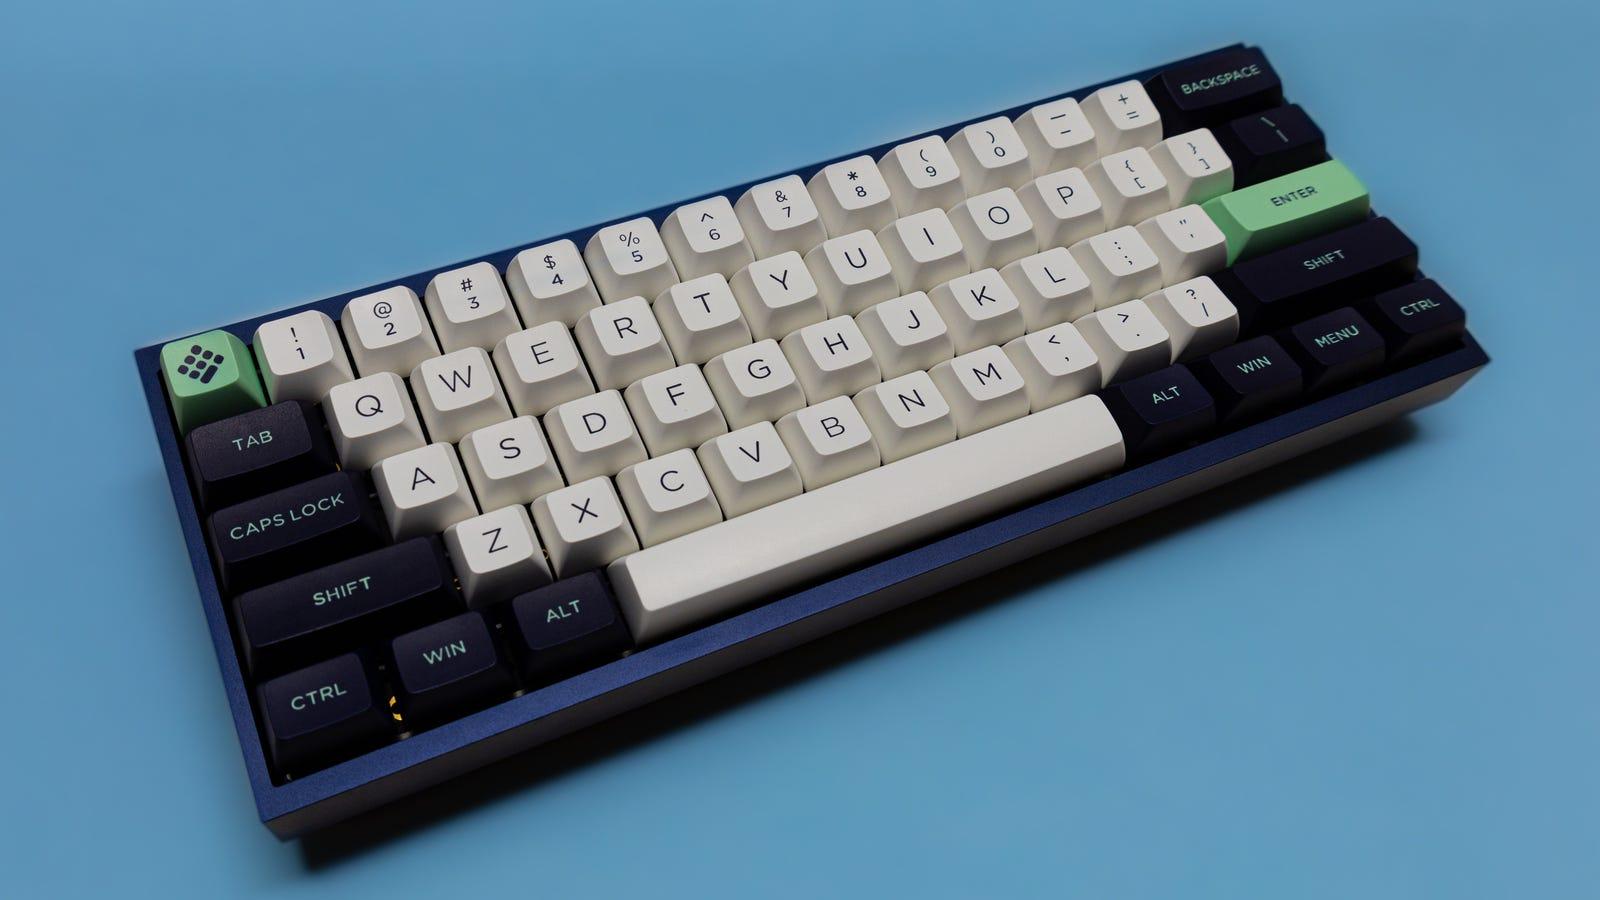 60% mechanical keyboard against blue background